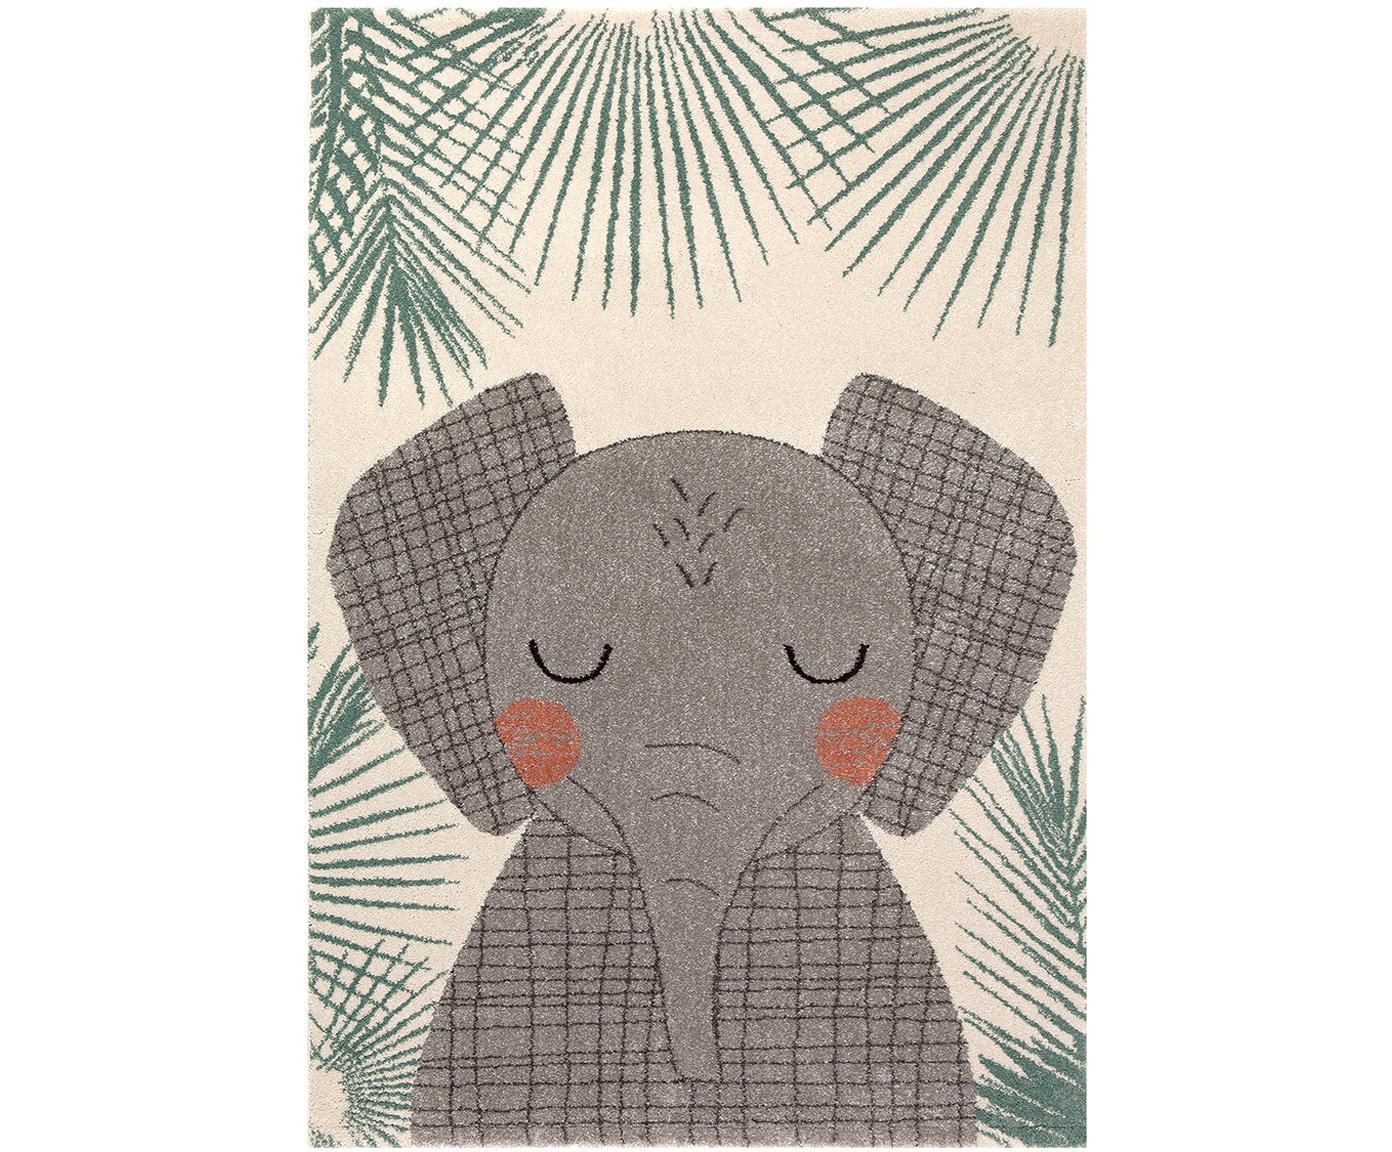 Tappeto in polipropilene con elefante Junko, Polipropilene, Beige, verde, grigio, Larg. 120 x Lung. 170 cm